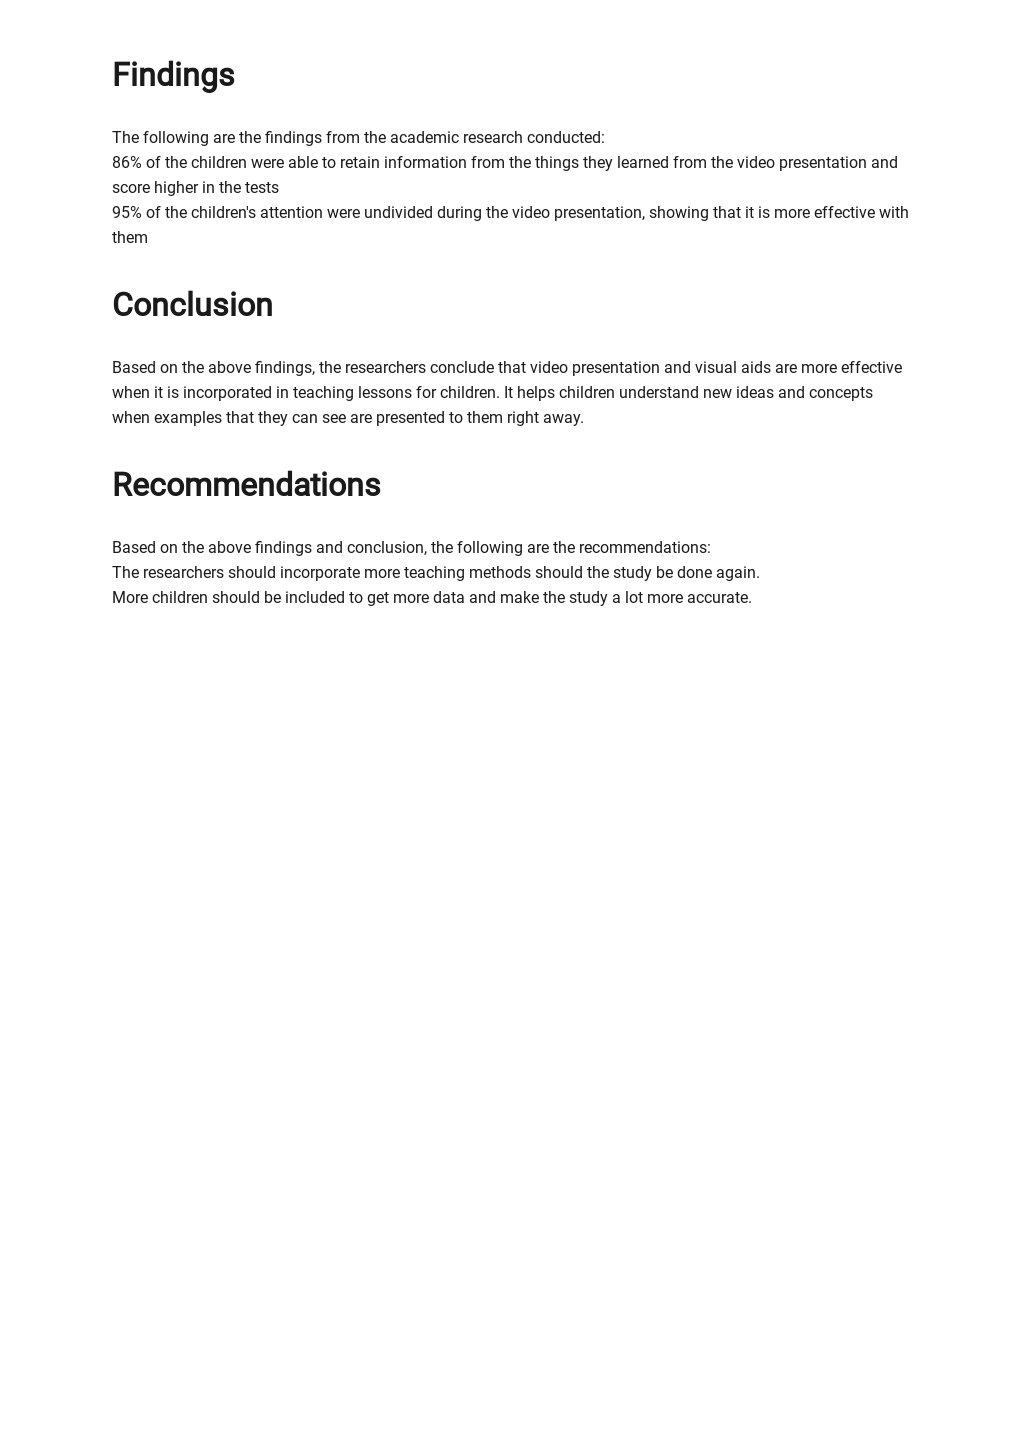 Academic Research Report Template 2.jpe